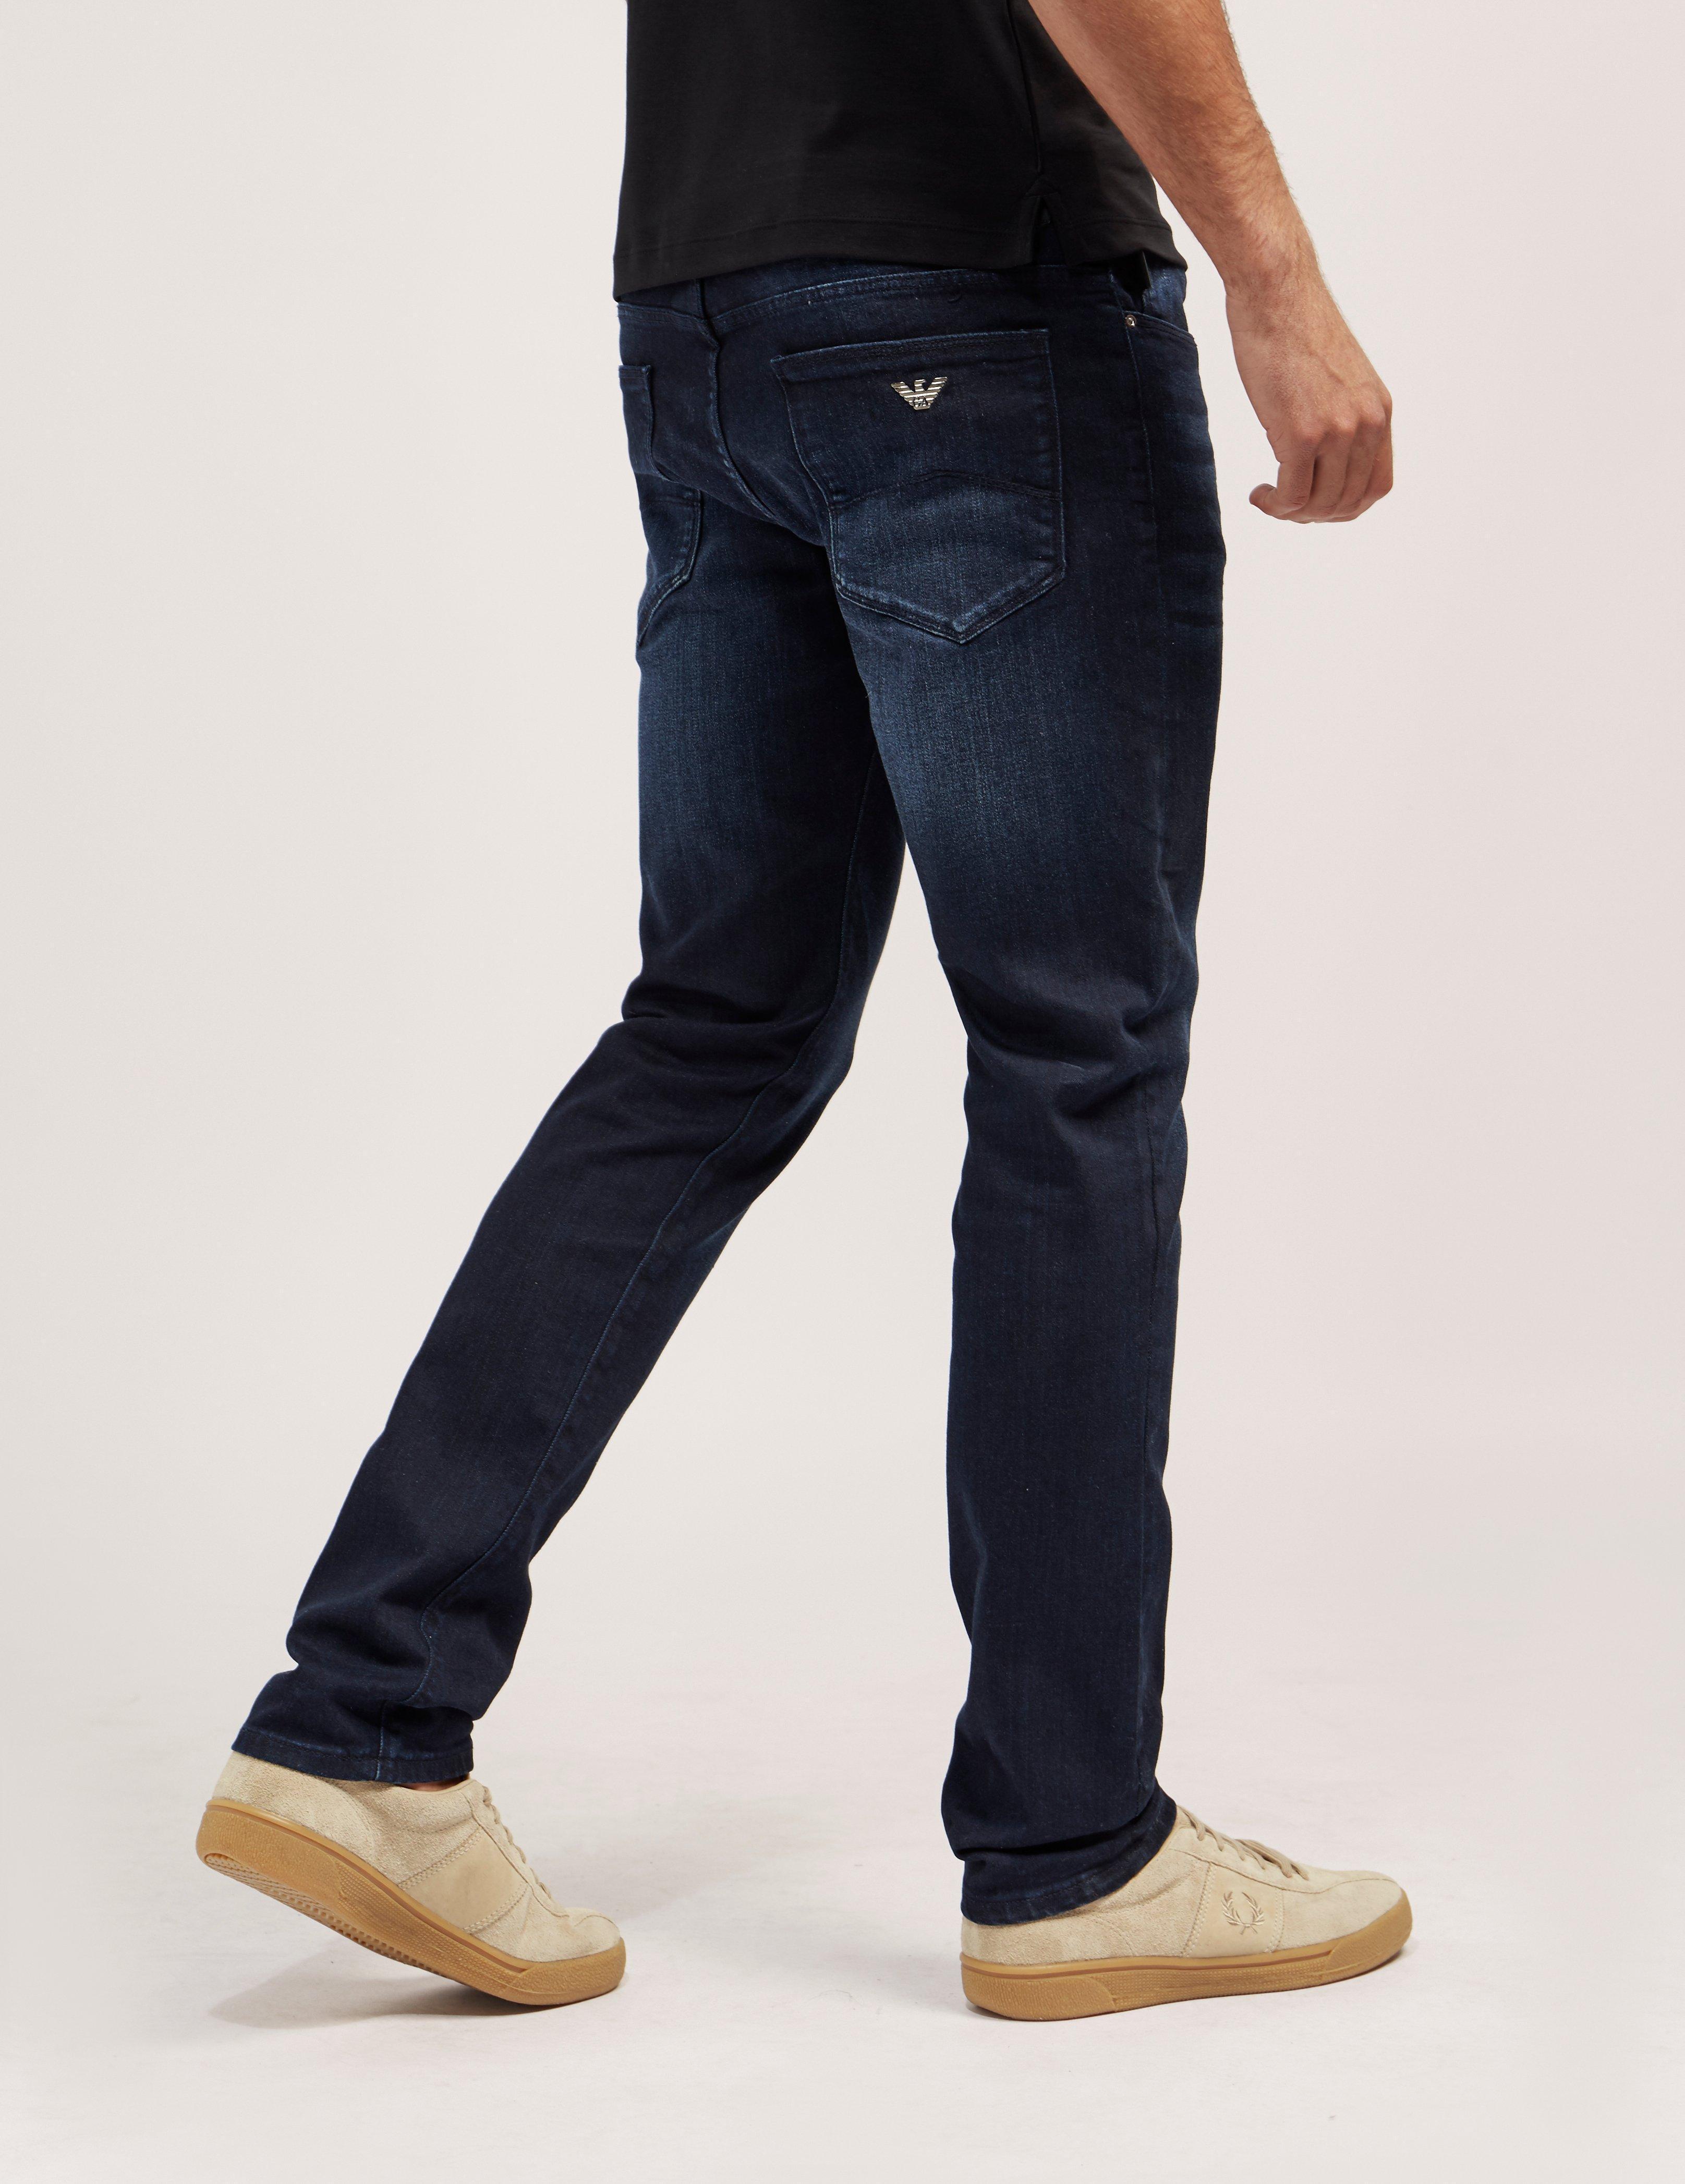 654af2e1f63d Gallery. Previously sold at  Tessuti UK · Men s Distressed Jeans Men s  Black Skinny ...